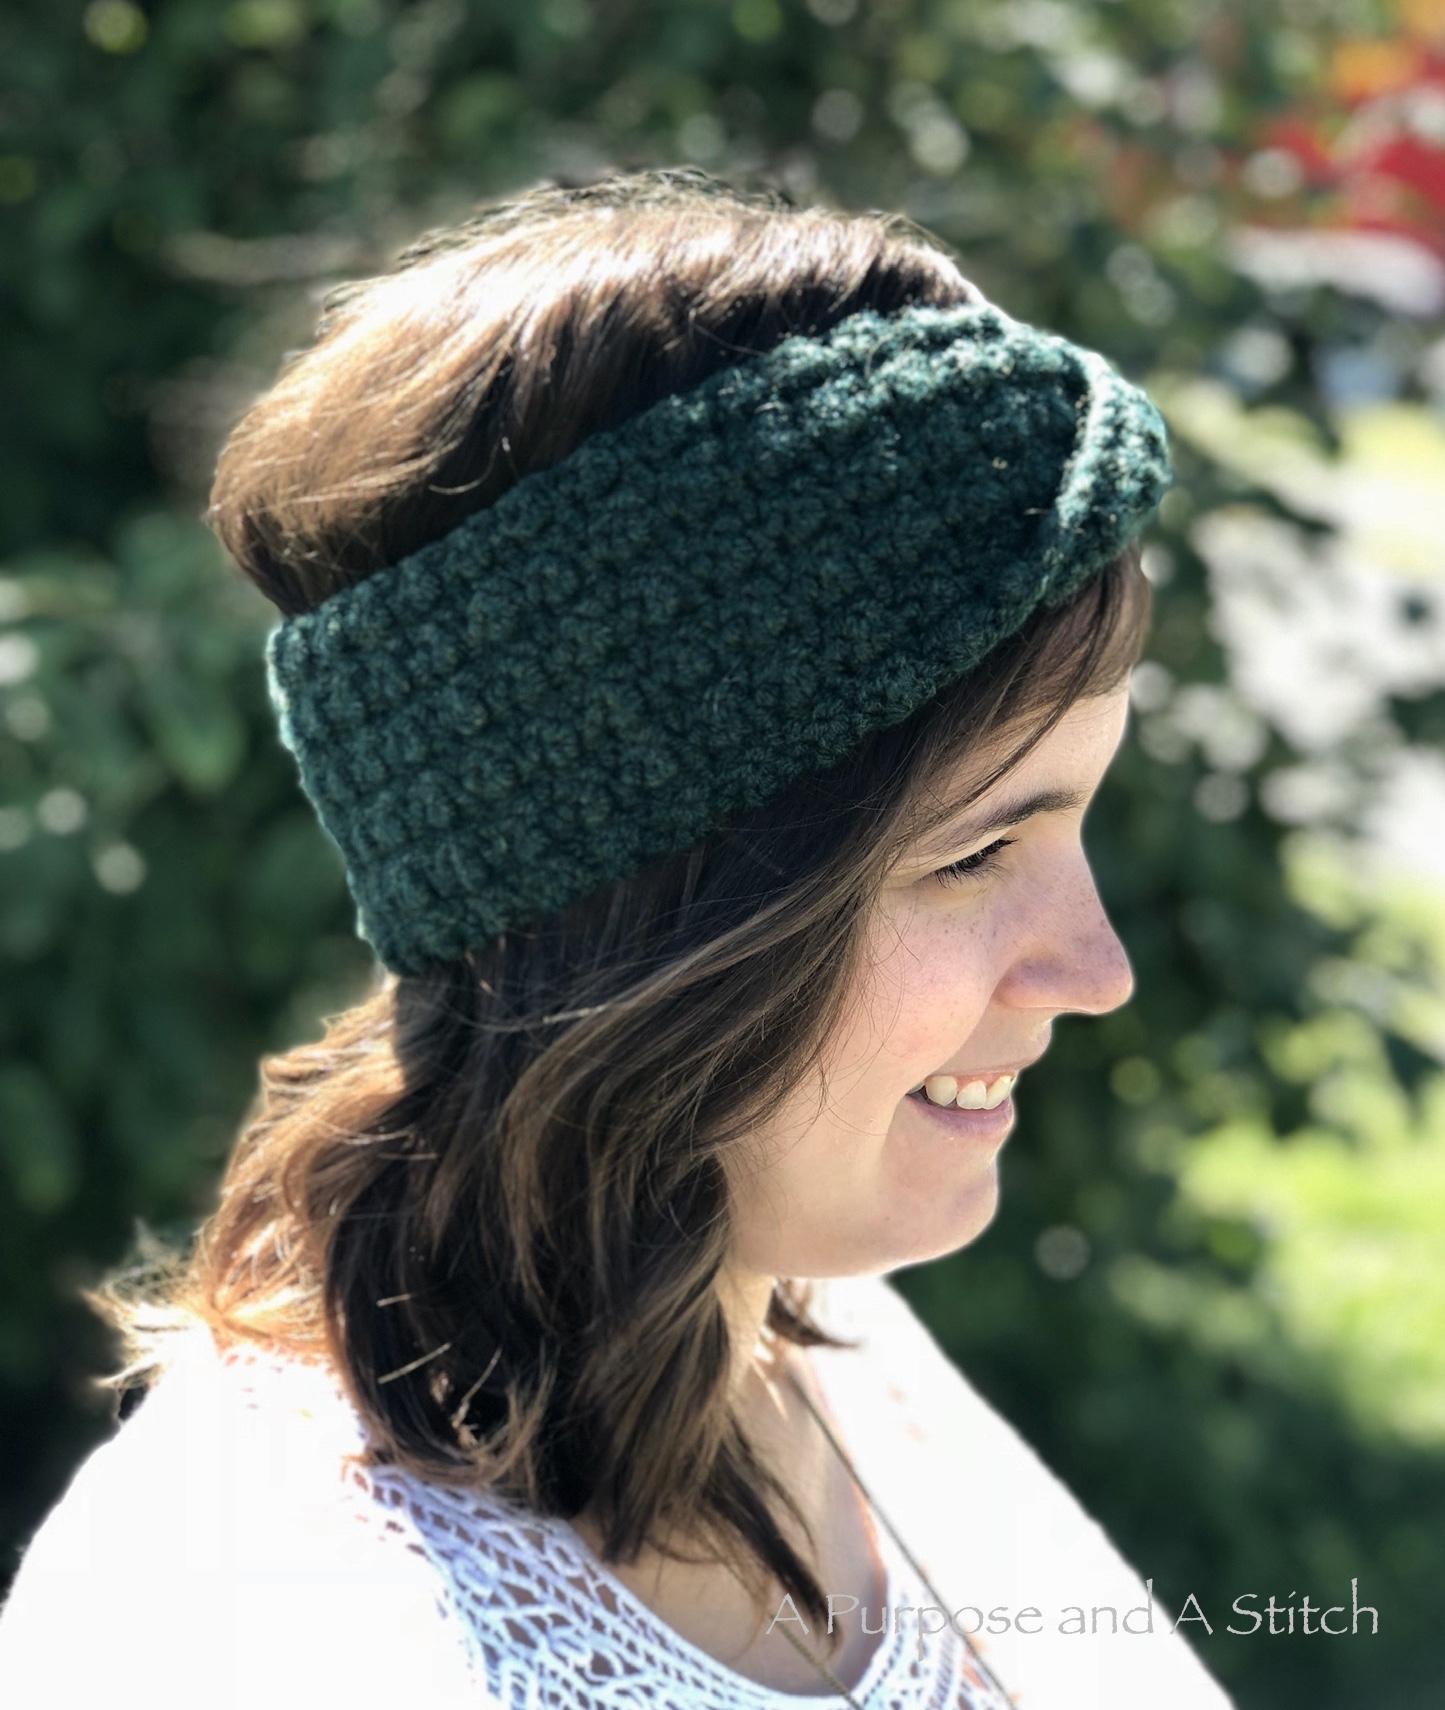 Twisted Seed Headband A Purpose And A Stitch